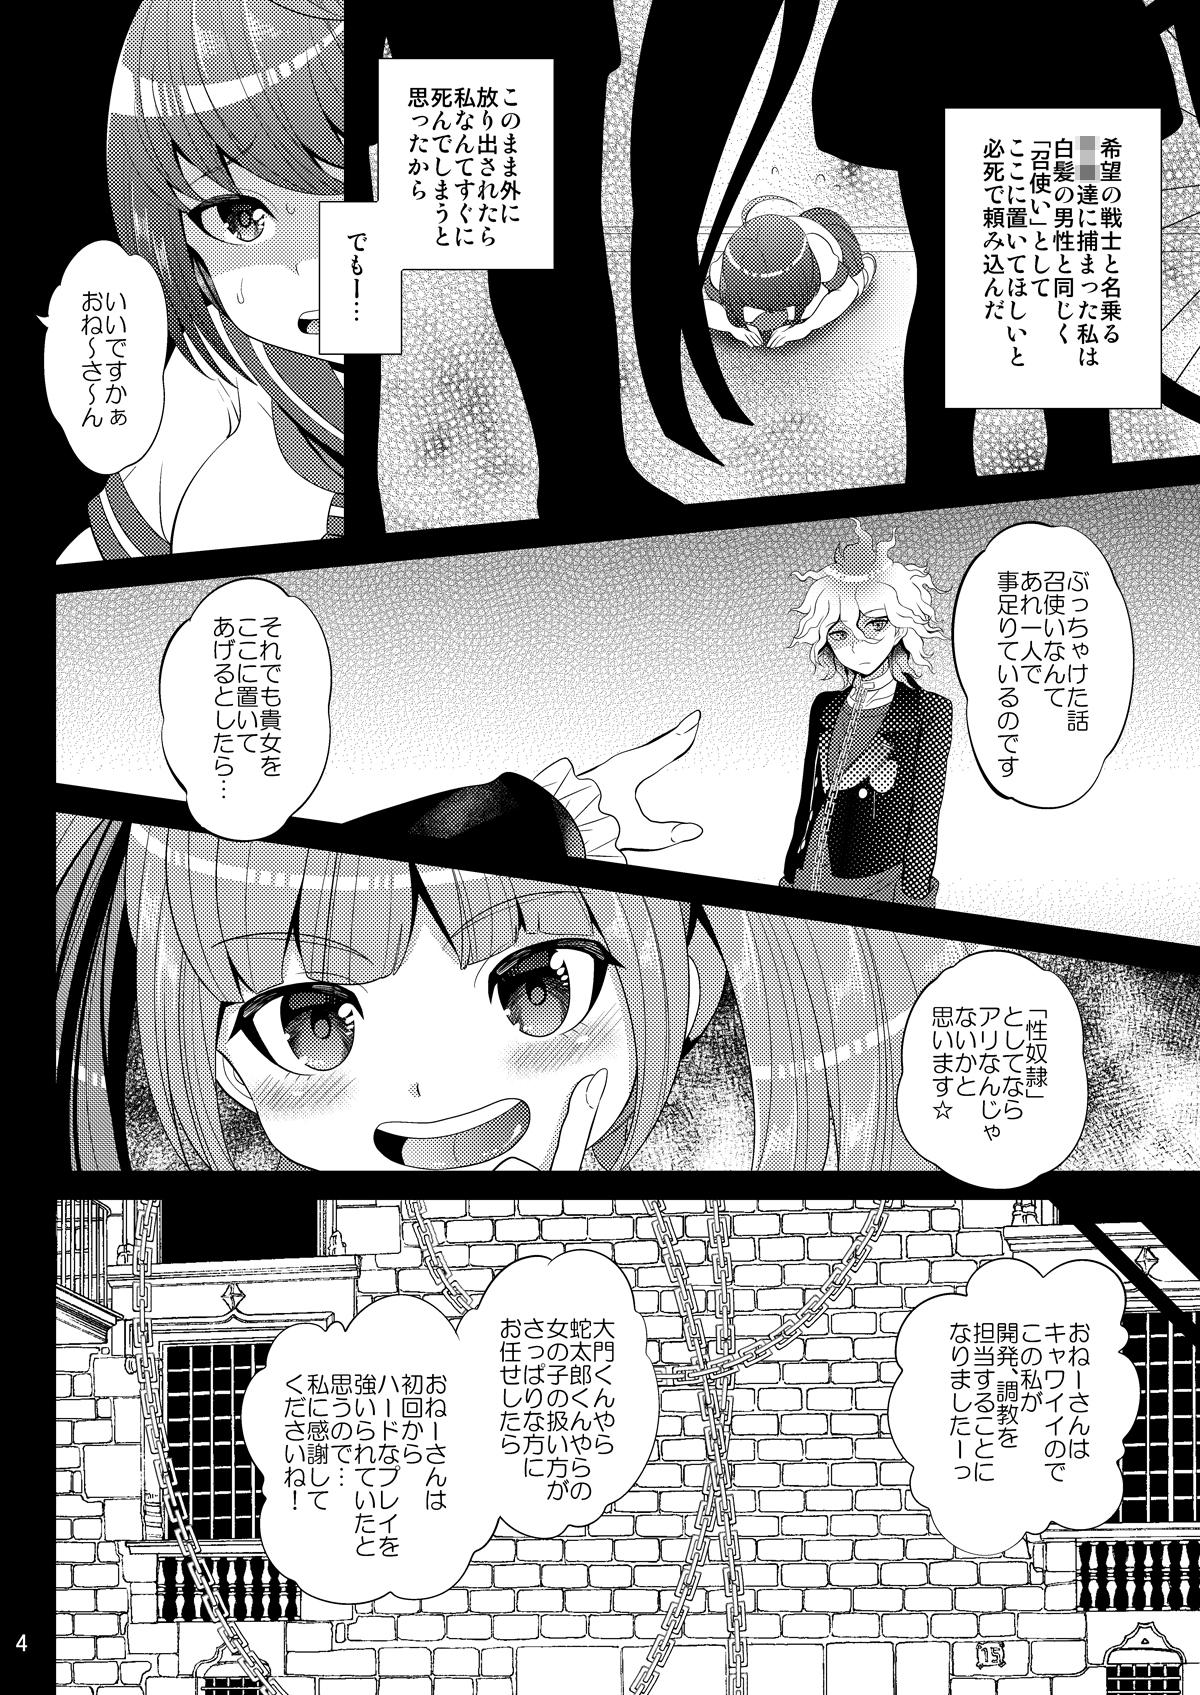 Kibou no Idenshi 3